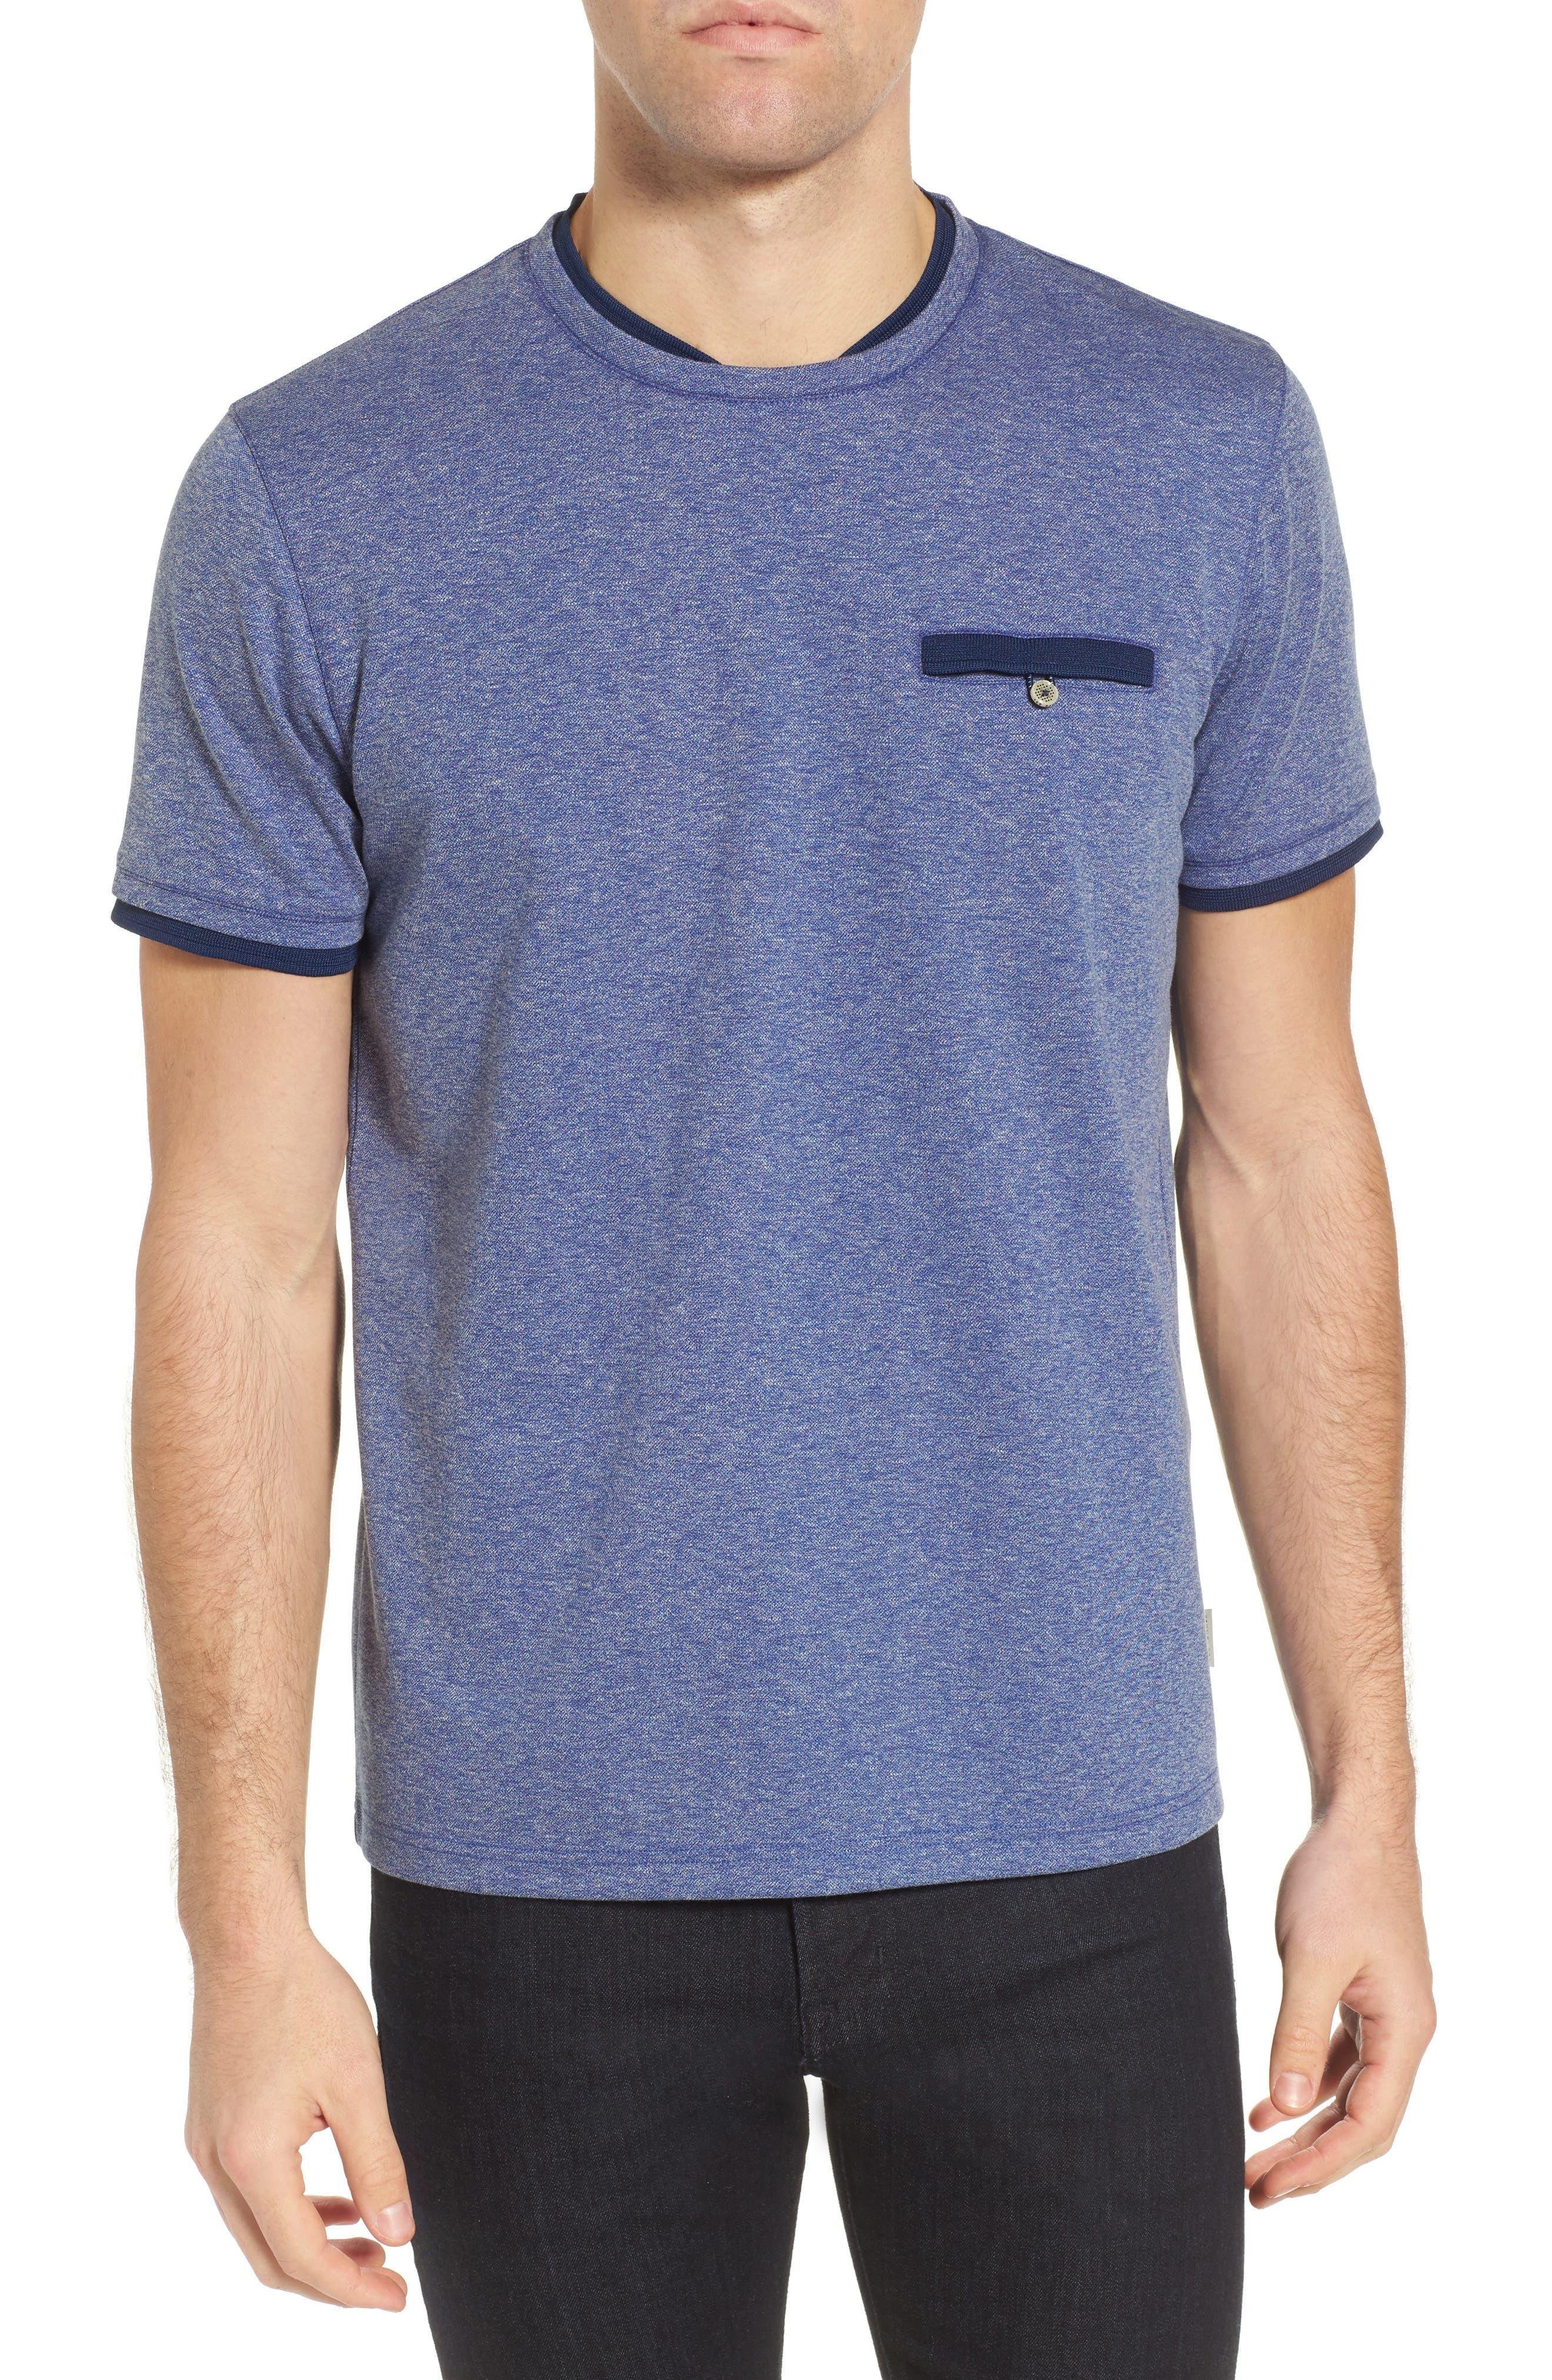 Alternate Image 1 Selected - Ted Baker London Climb Mouline Layered Pocket T-Shirt